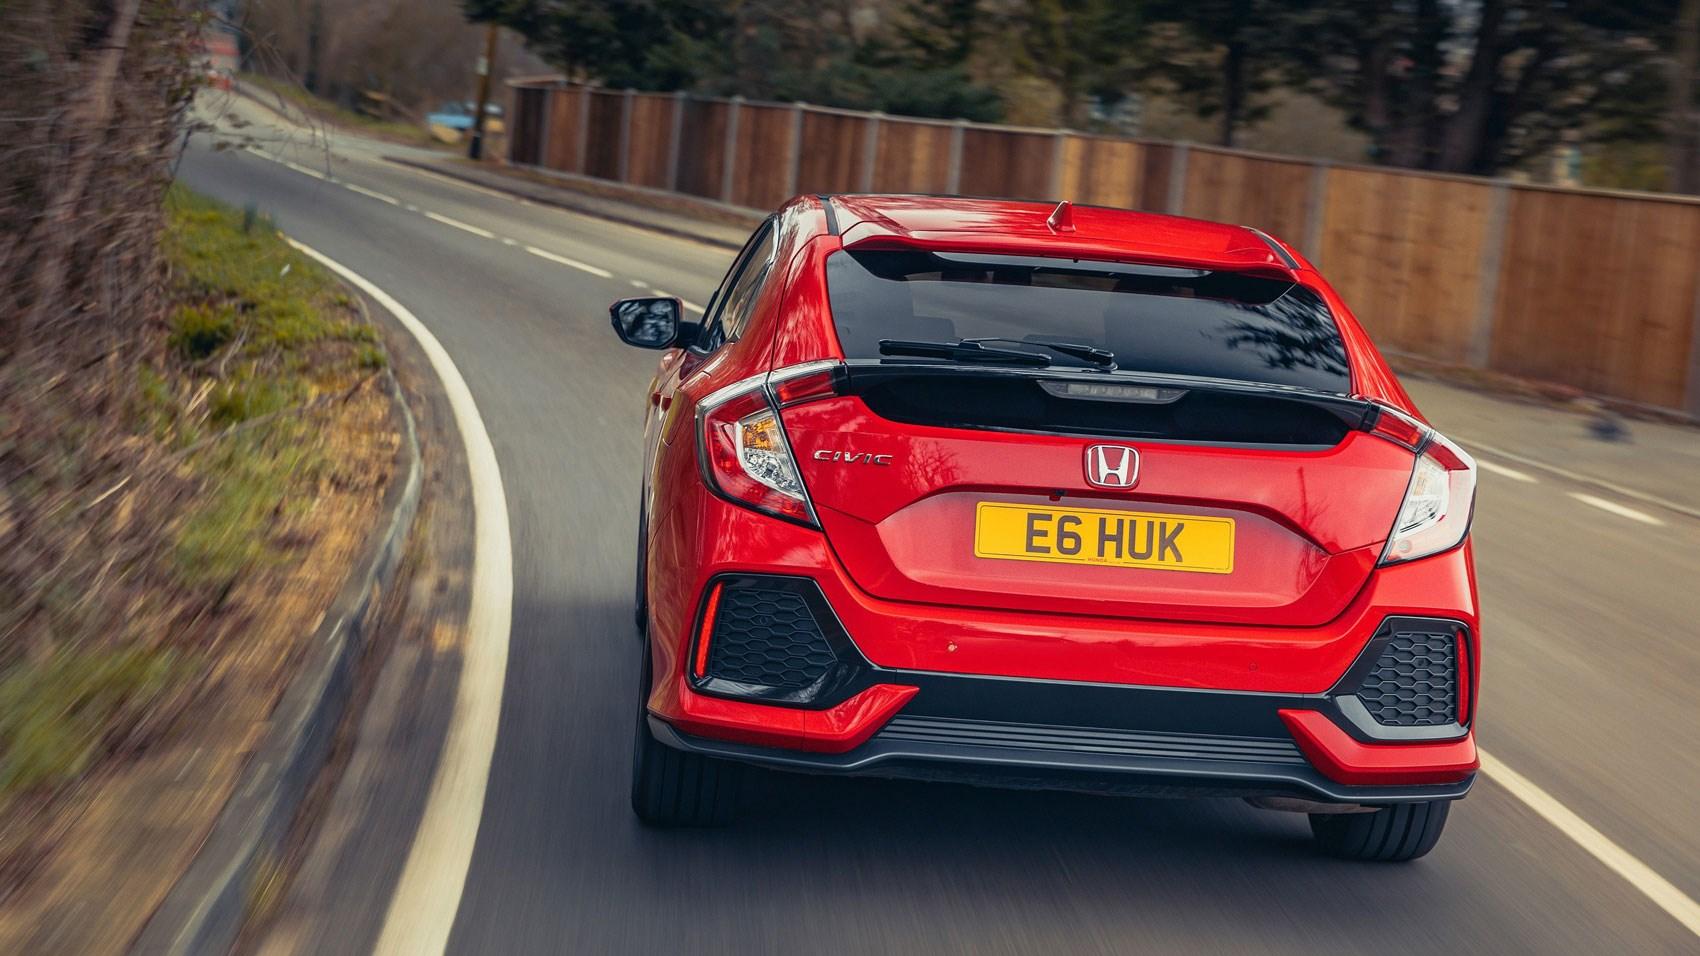 Honda Civic 1 0 VTEC Turbo EX manual (2018) review   CAR